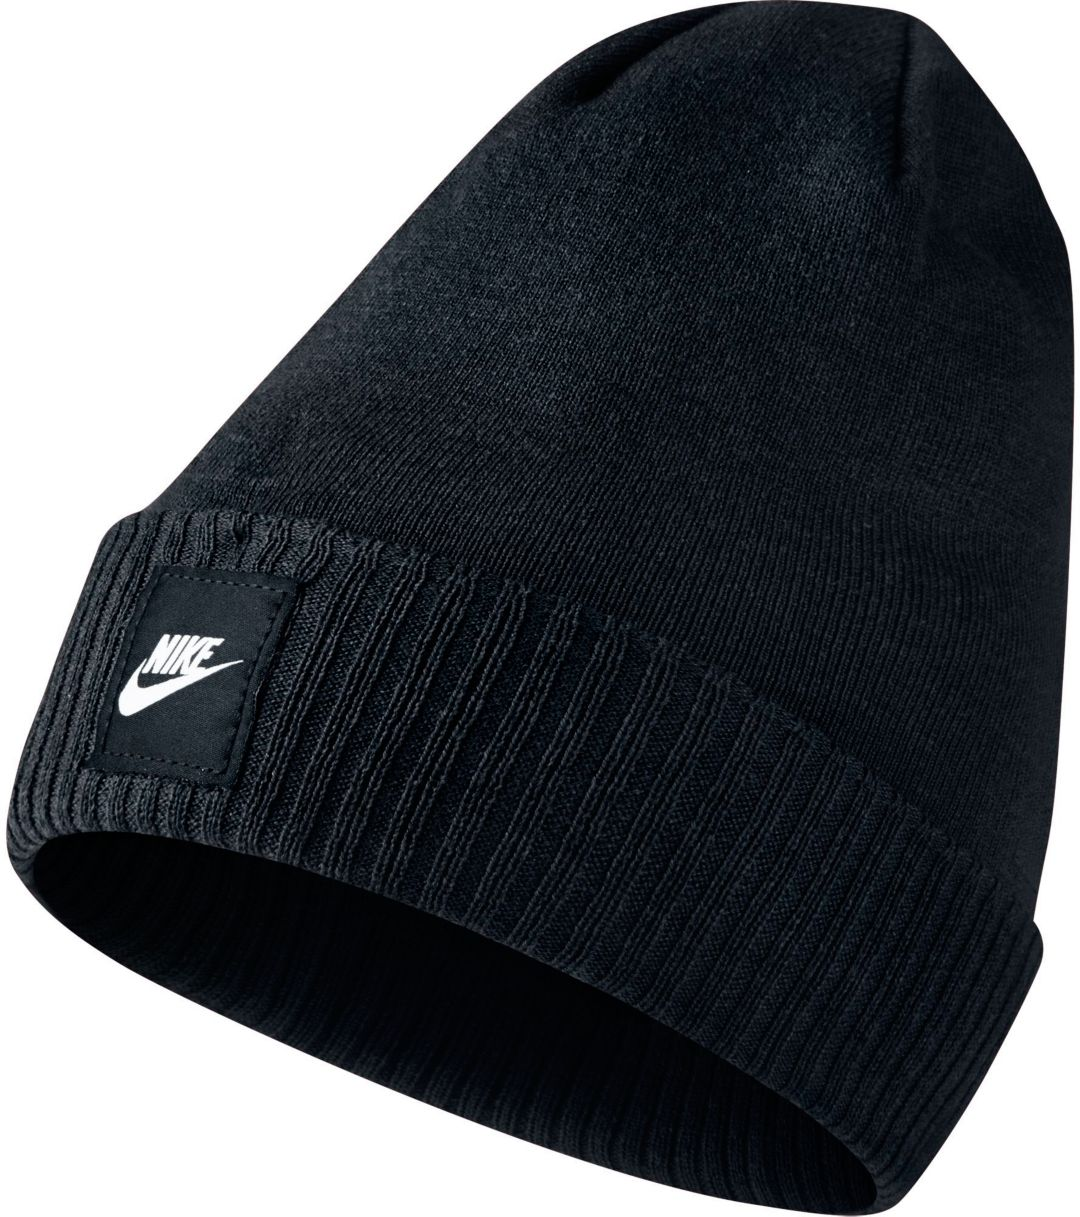 0540e68b5 Nike Men's Futura Knit Beanie